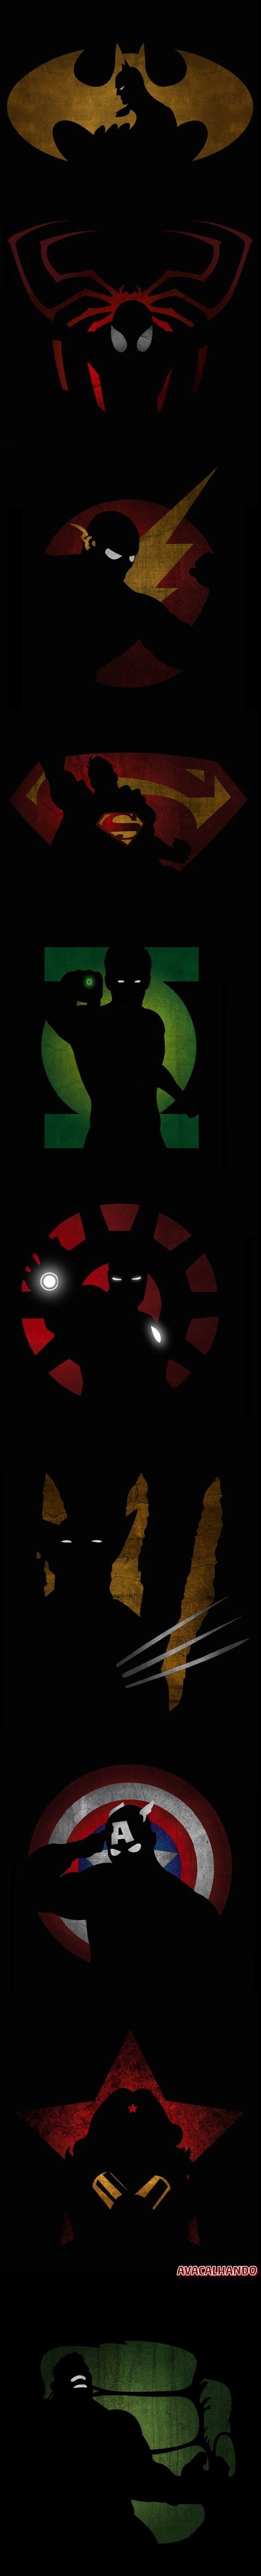 Avacalhando: Heróis Nas Sombras